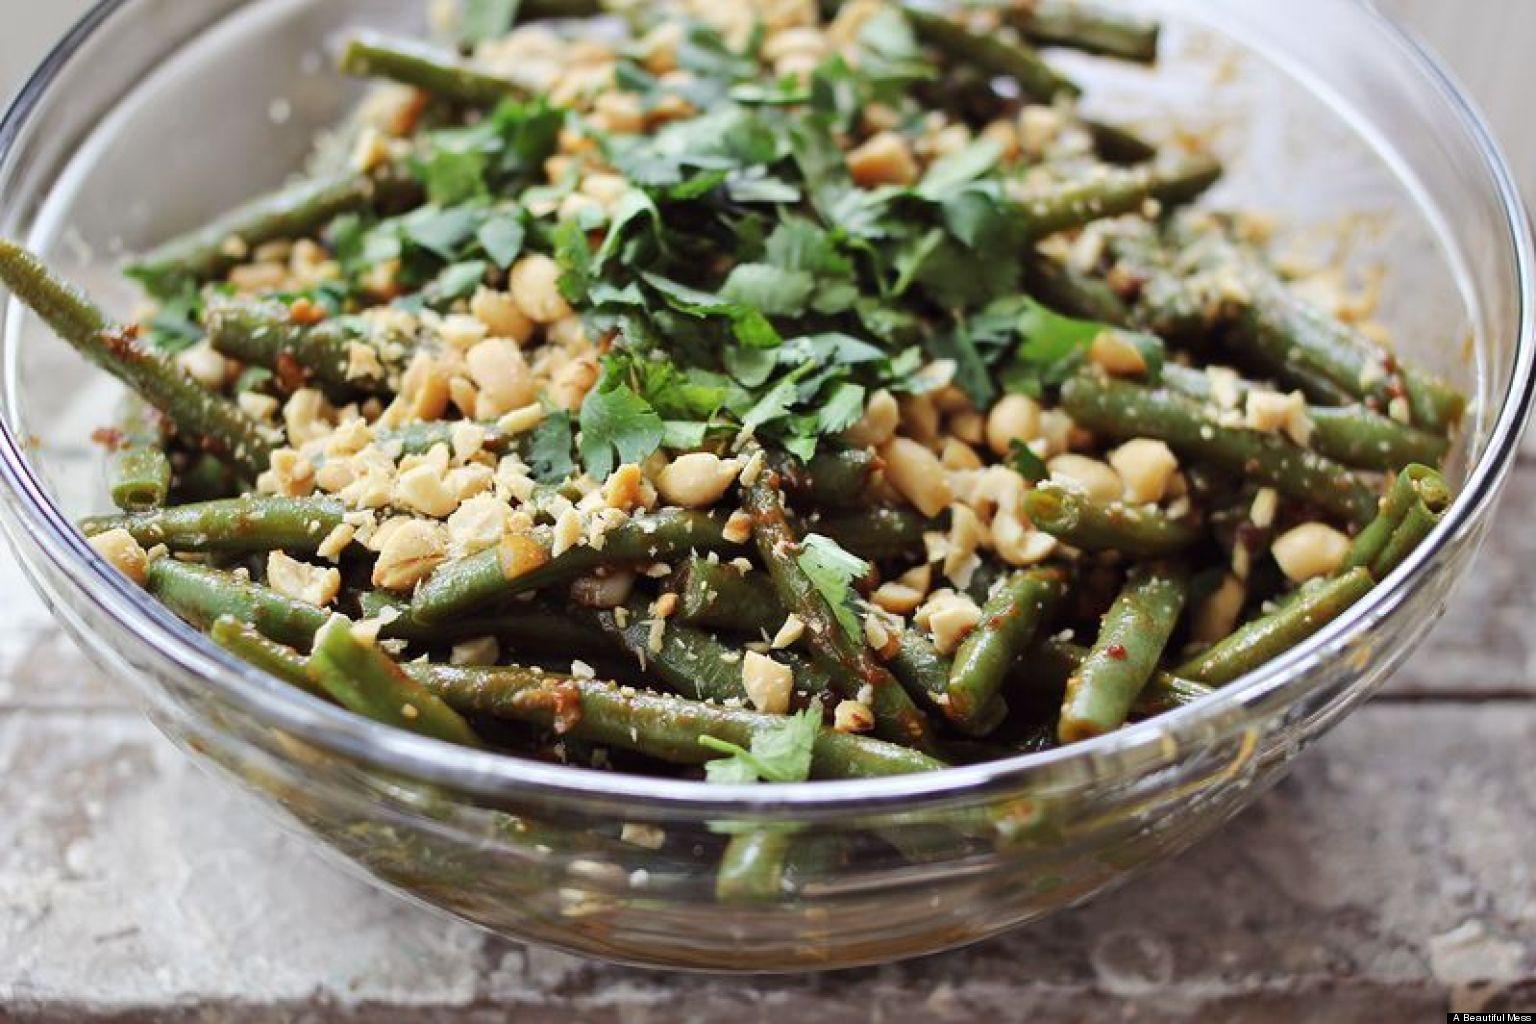 Savoury Rice | Slimming & Weight Watchers Friendly - Pinch ... |Savory Dishes